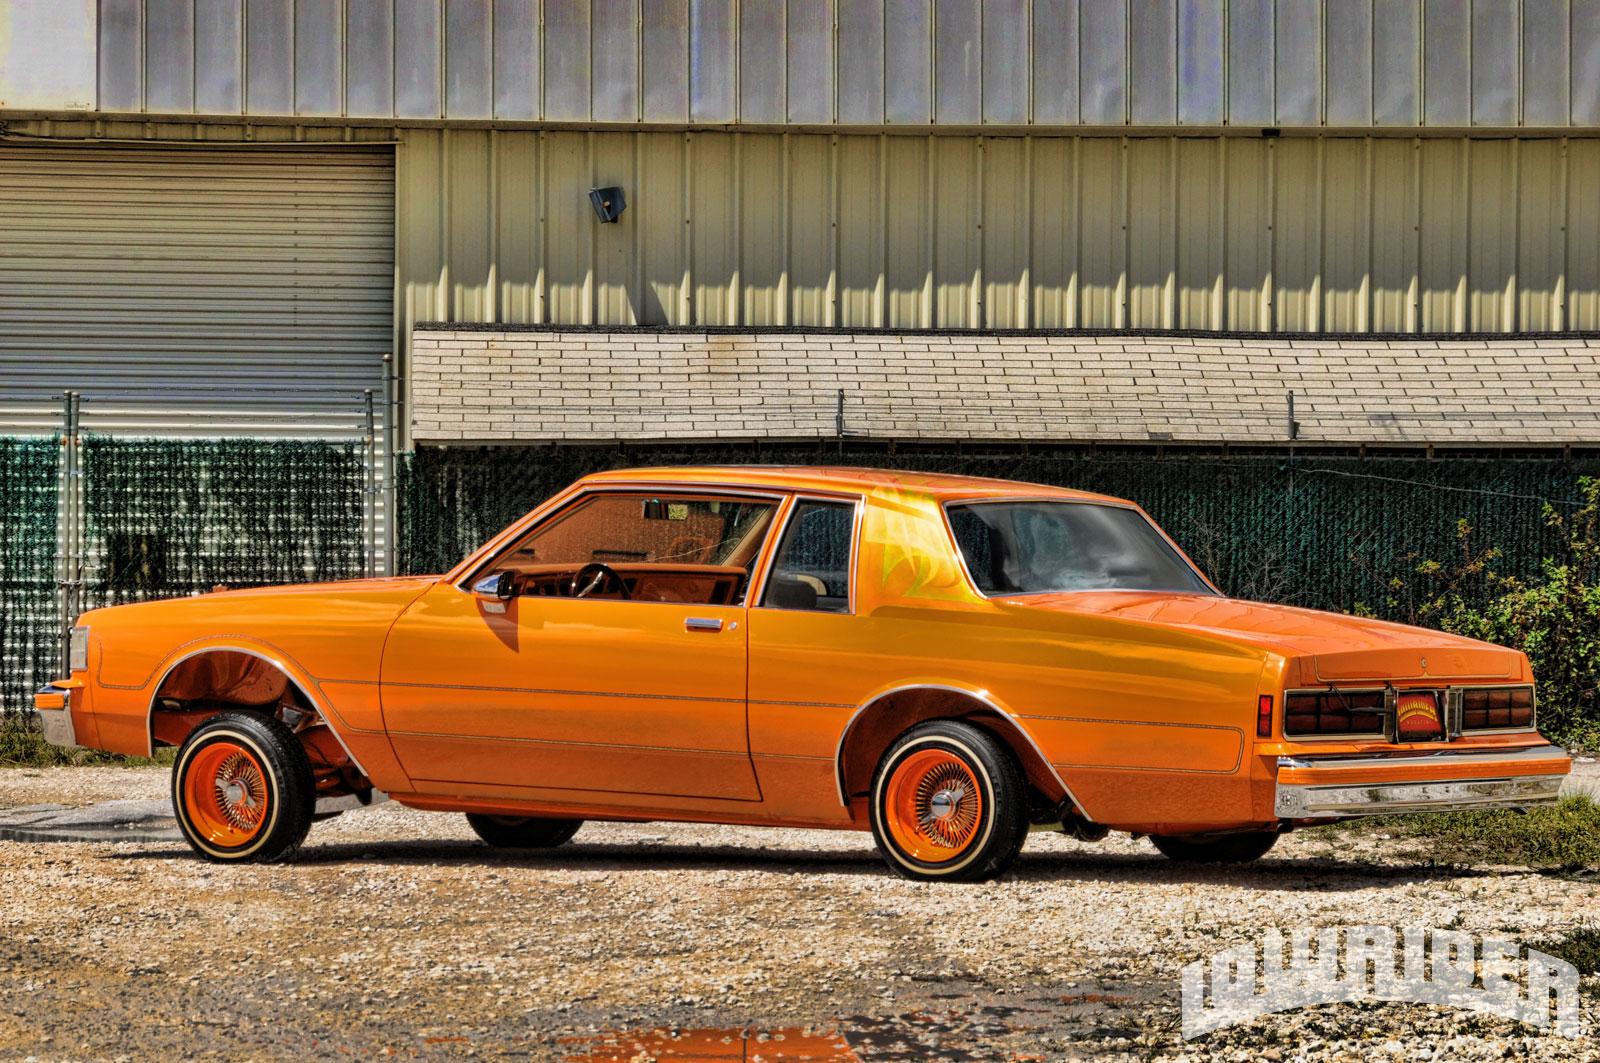 All Chevy chevy caprice 1985 : 1985 Chevrolet Caprice Classic - Lowrider Magazine